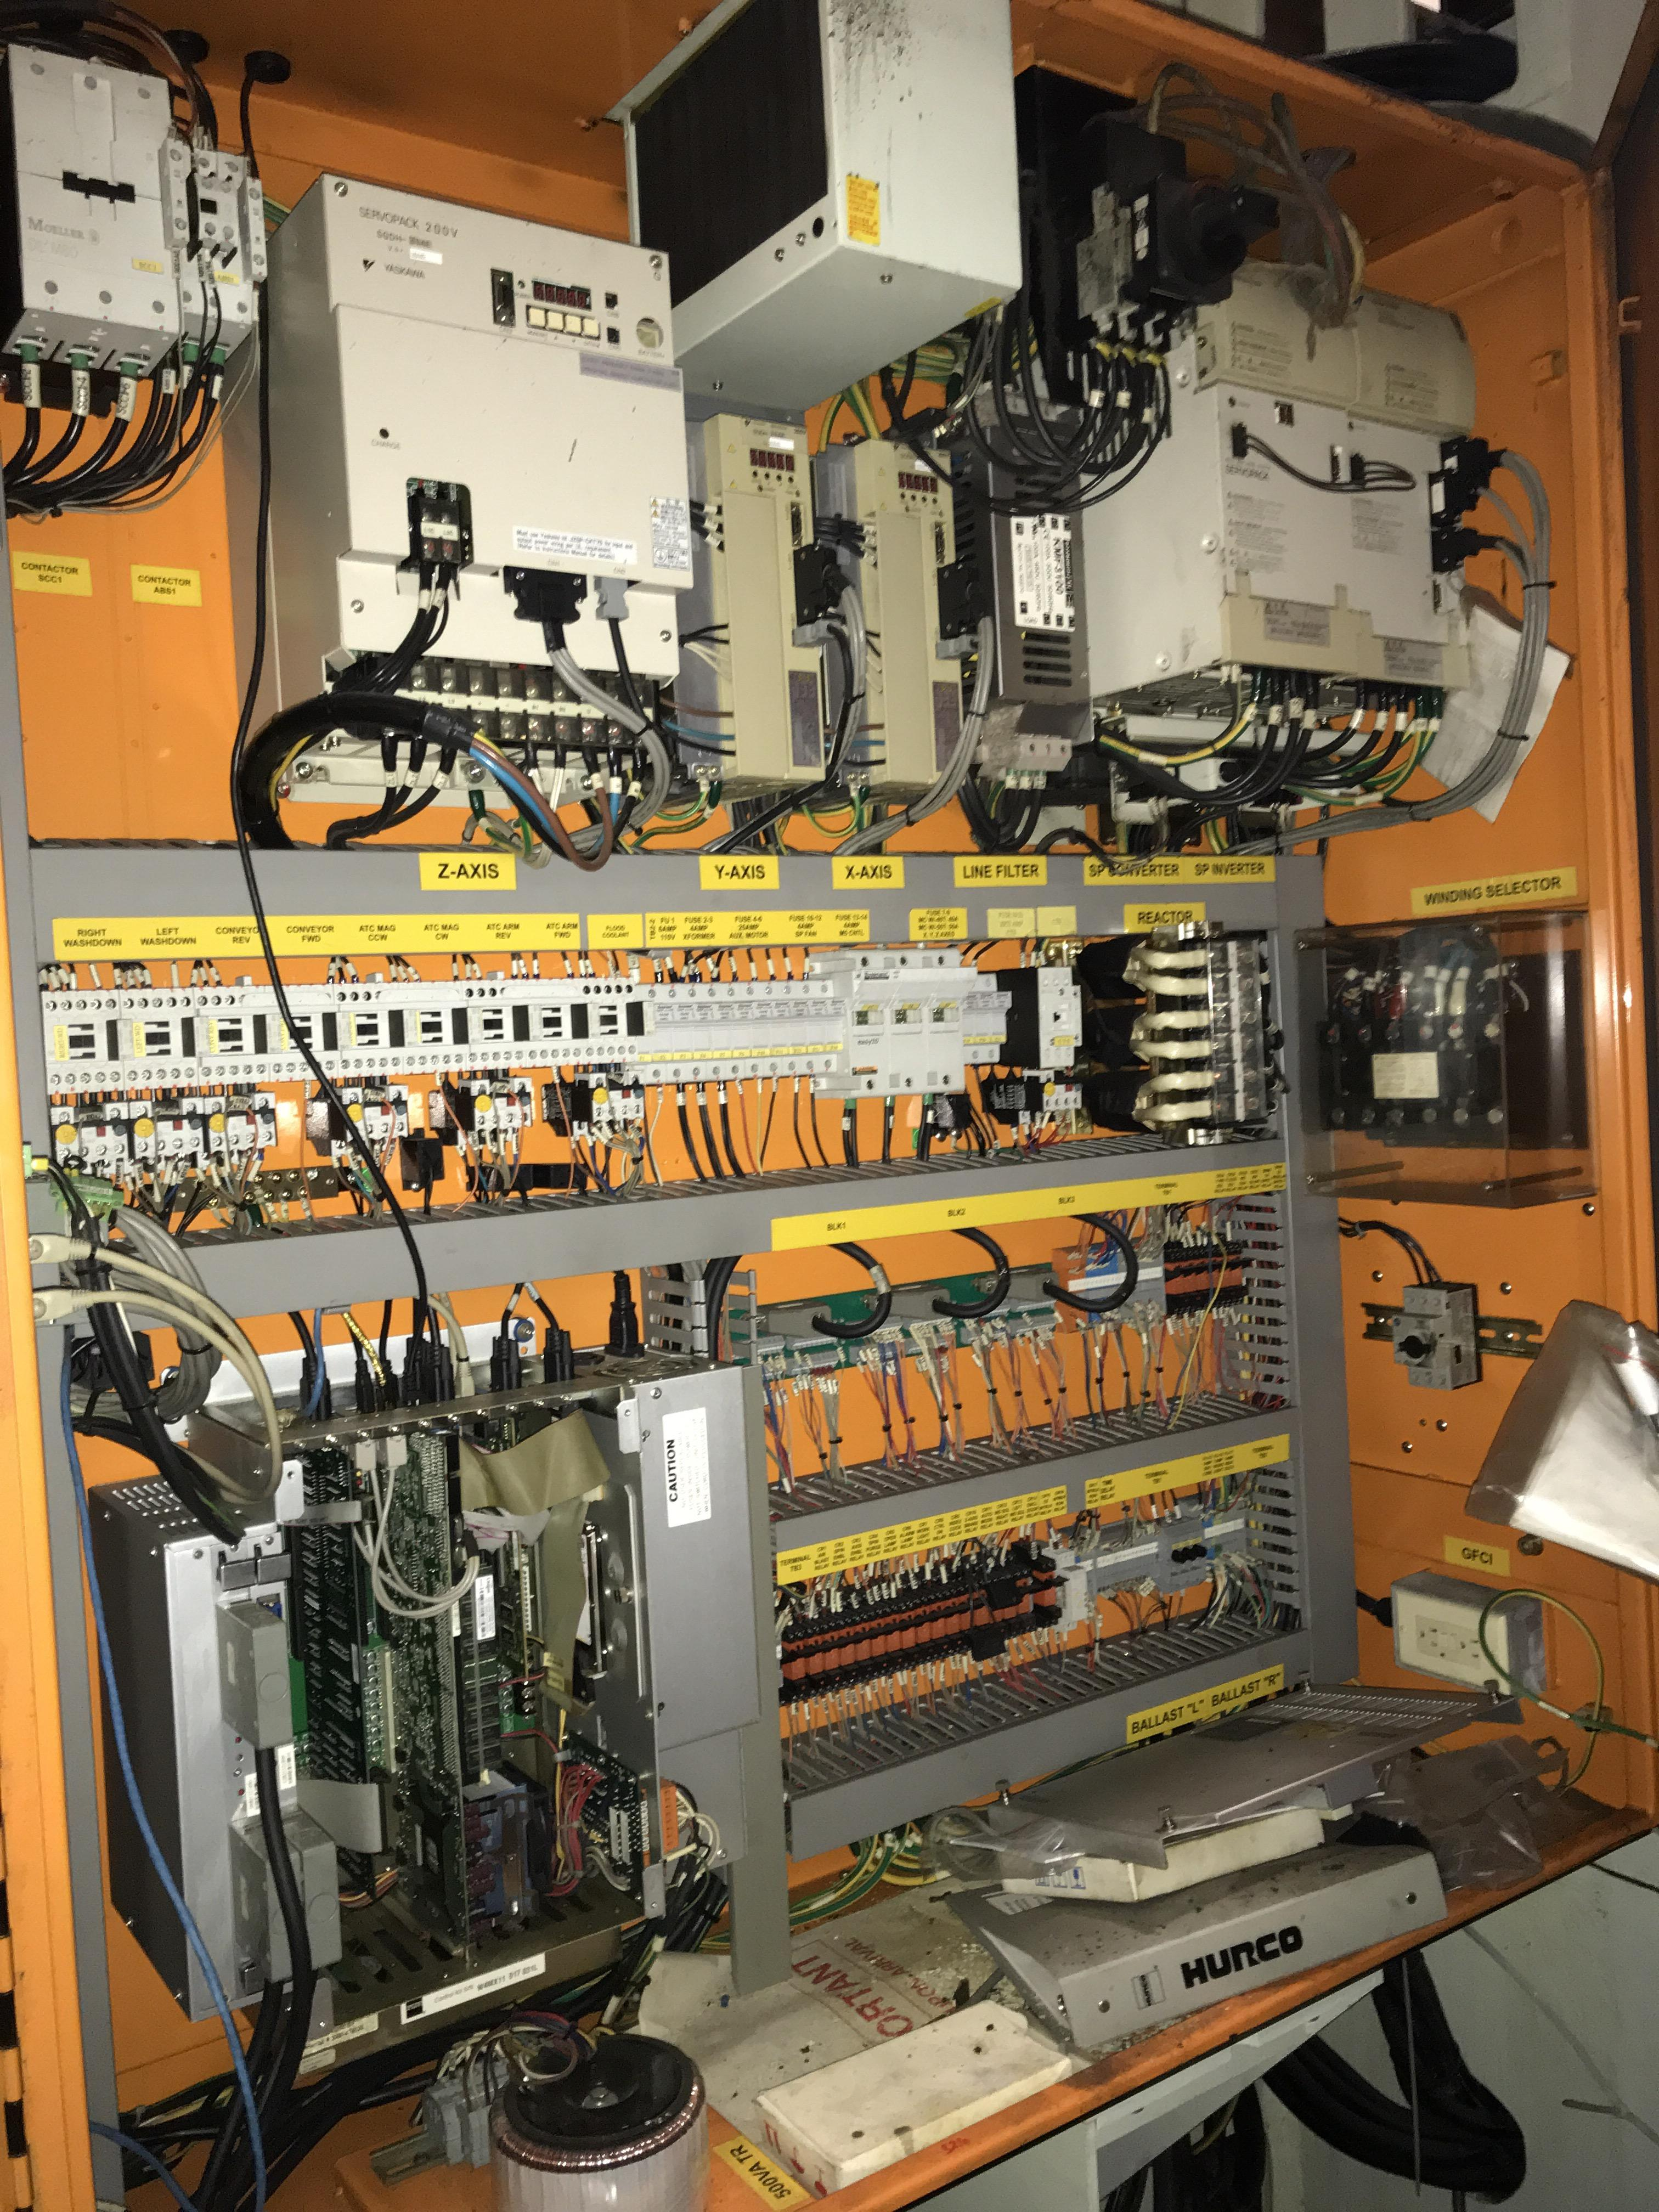 2012 HURCO VMX-84 - Vertical Machining Center